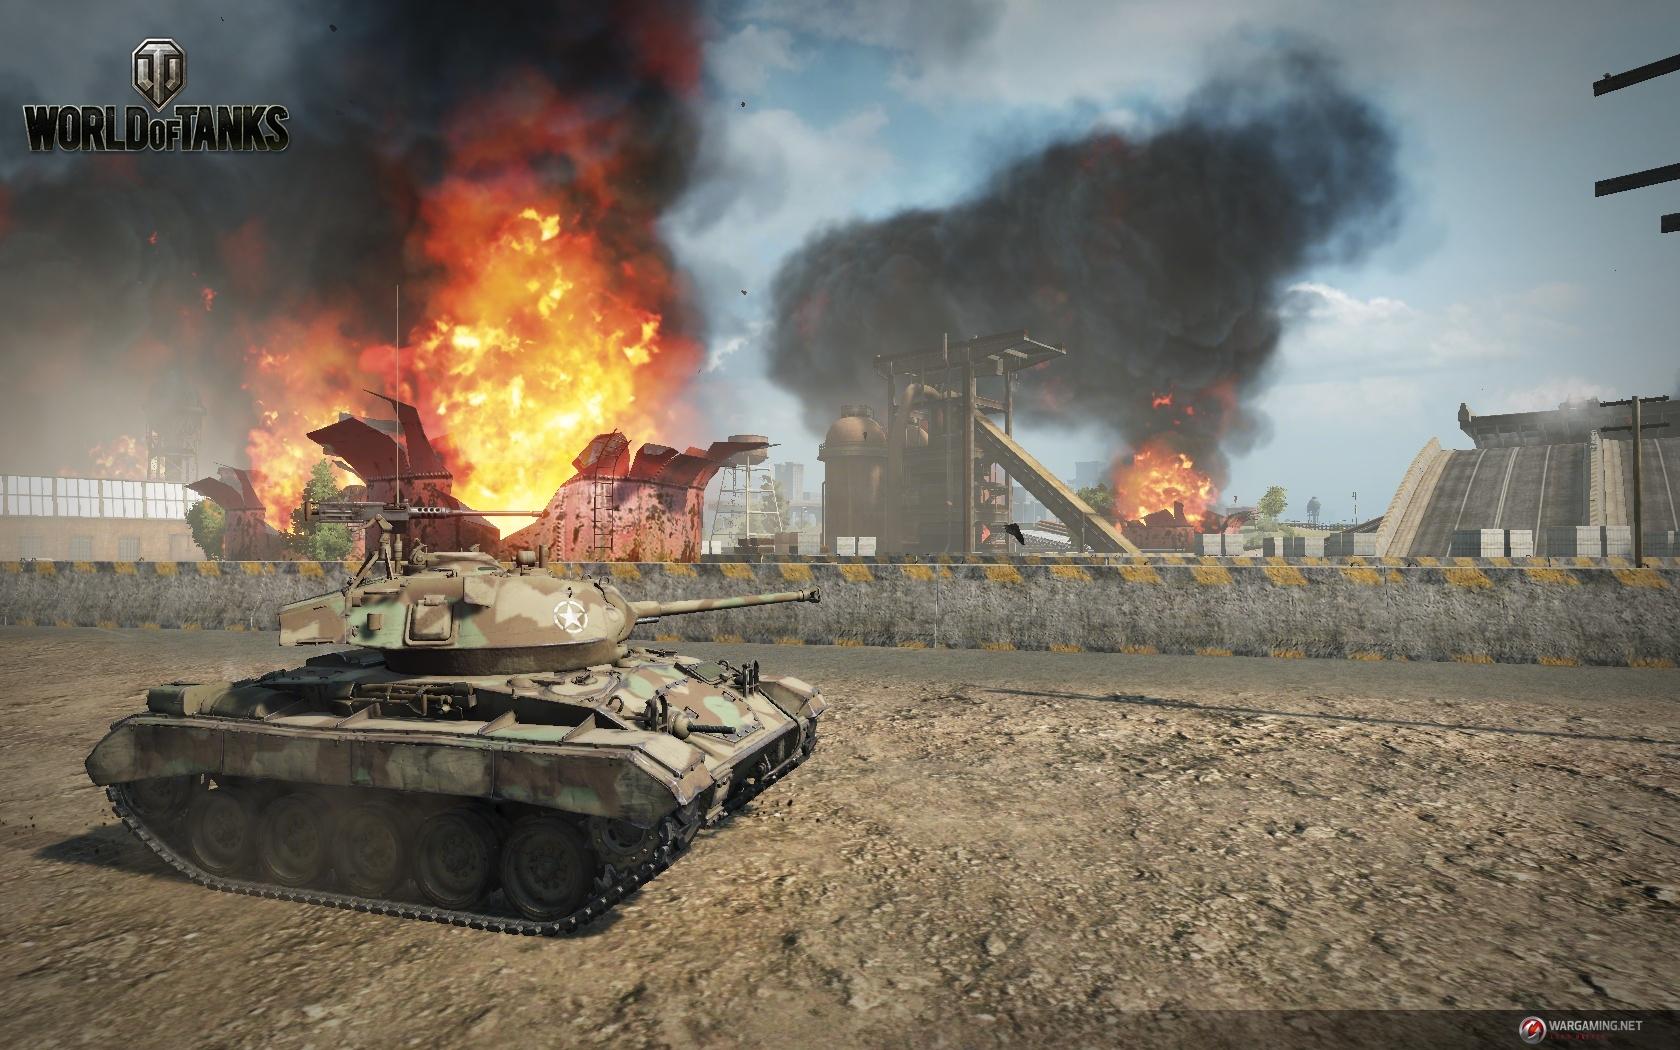 World-of-Tanks-Tank-Rally-mode-screenshot-1